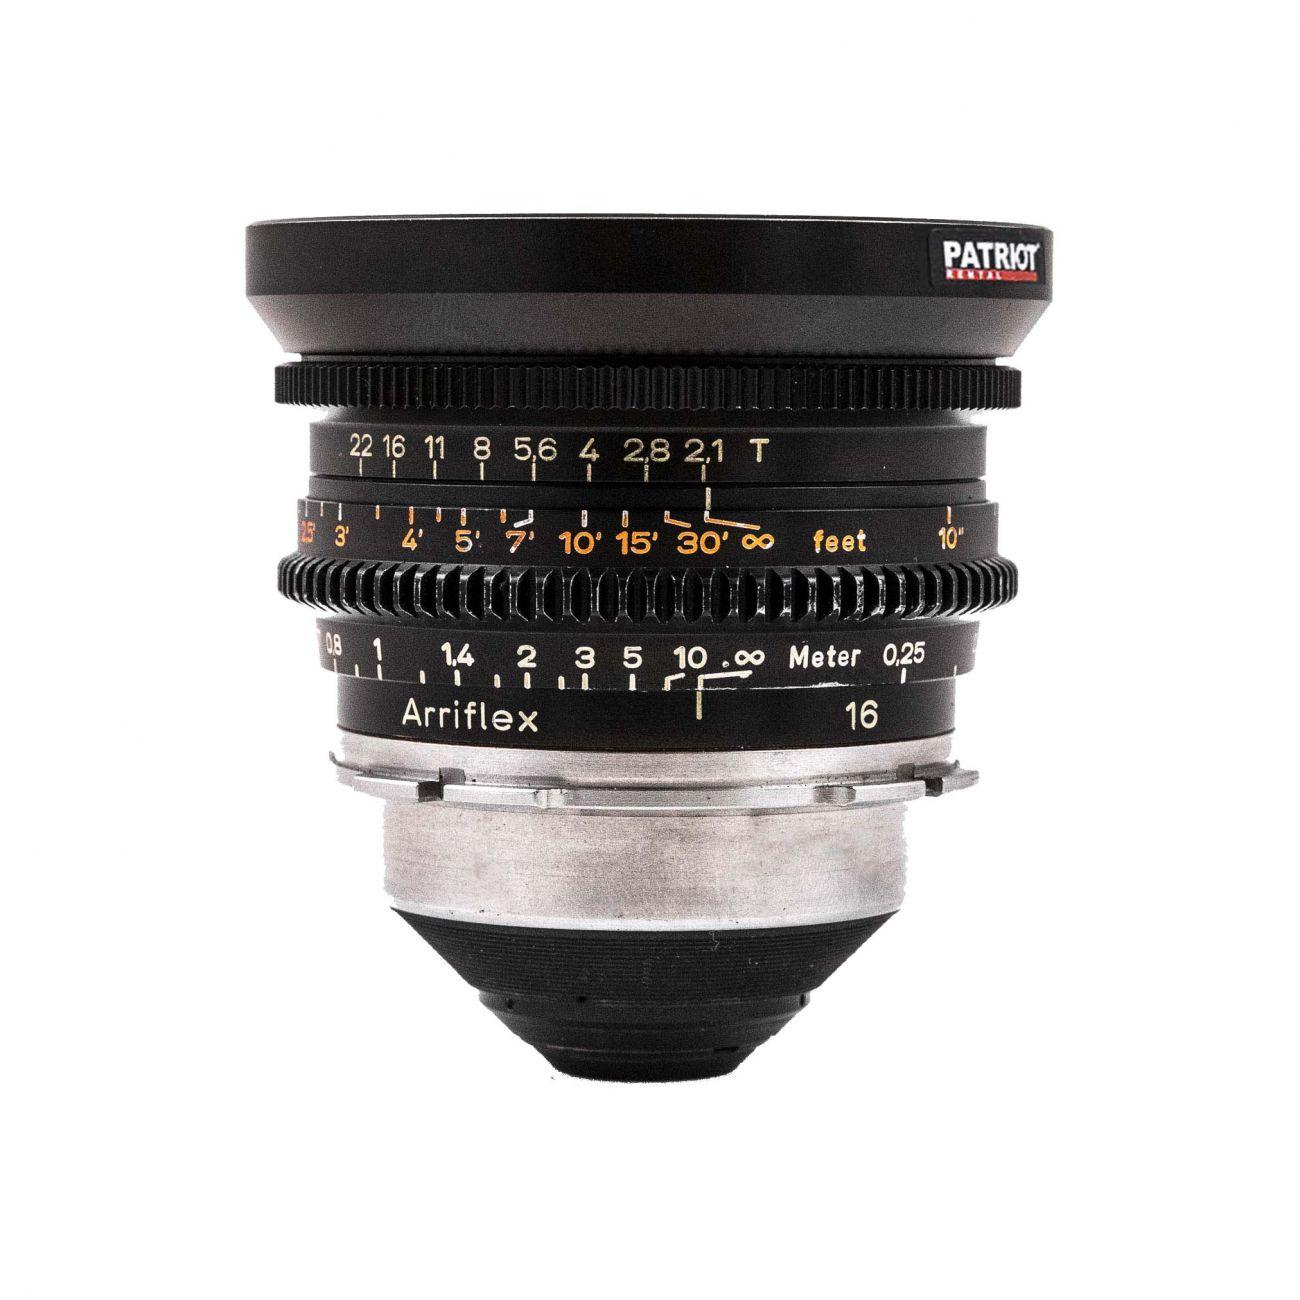 16 mm ZEISS PRIME Lens T2.1